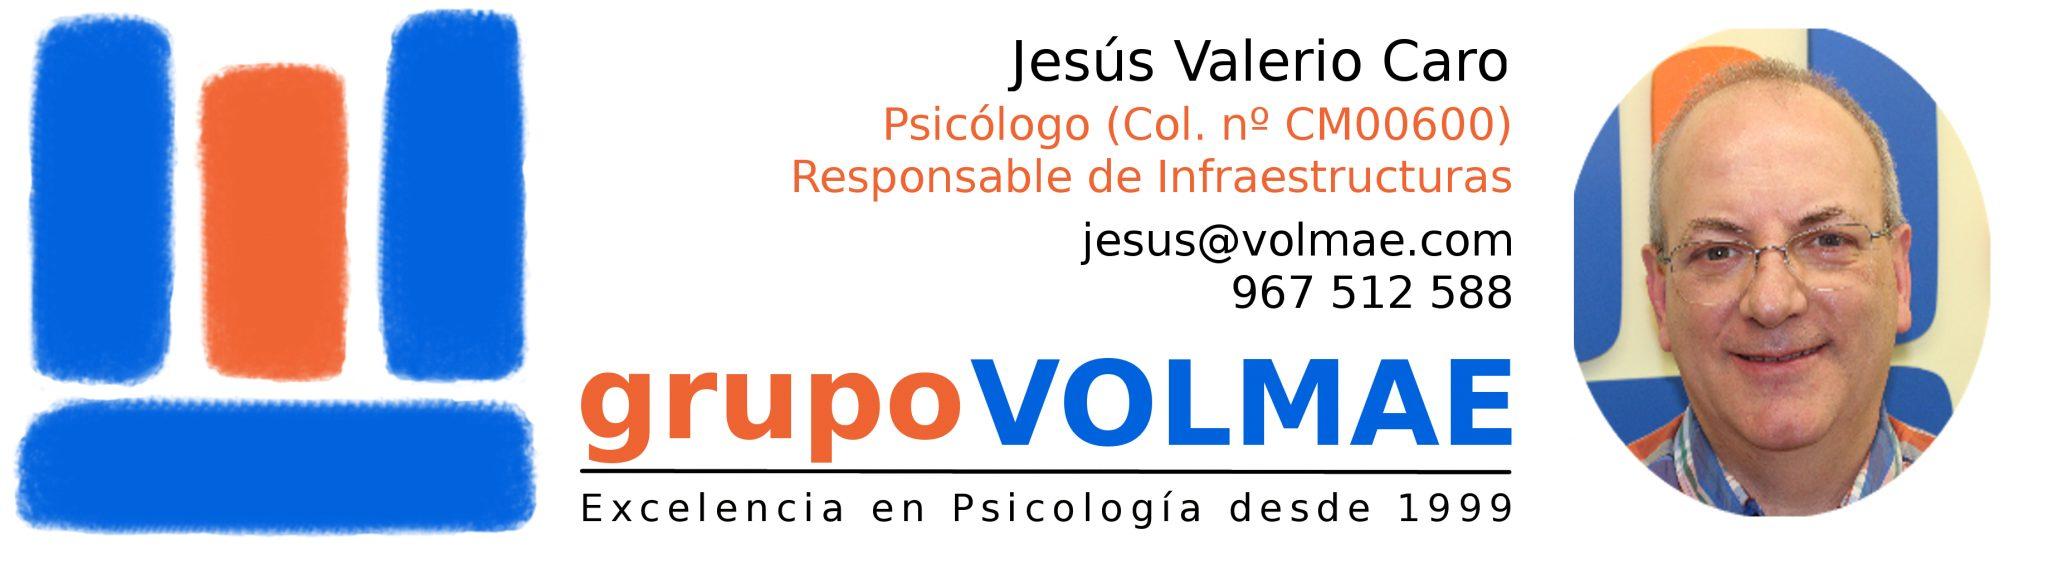 Jesús Javier Valerio - grupoVOLMAE- 2